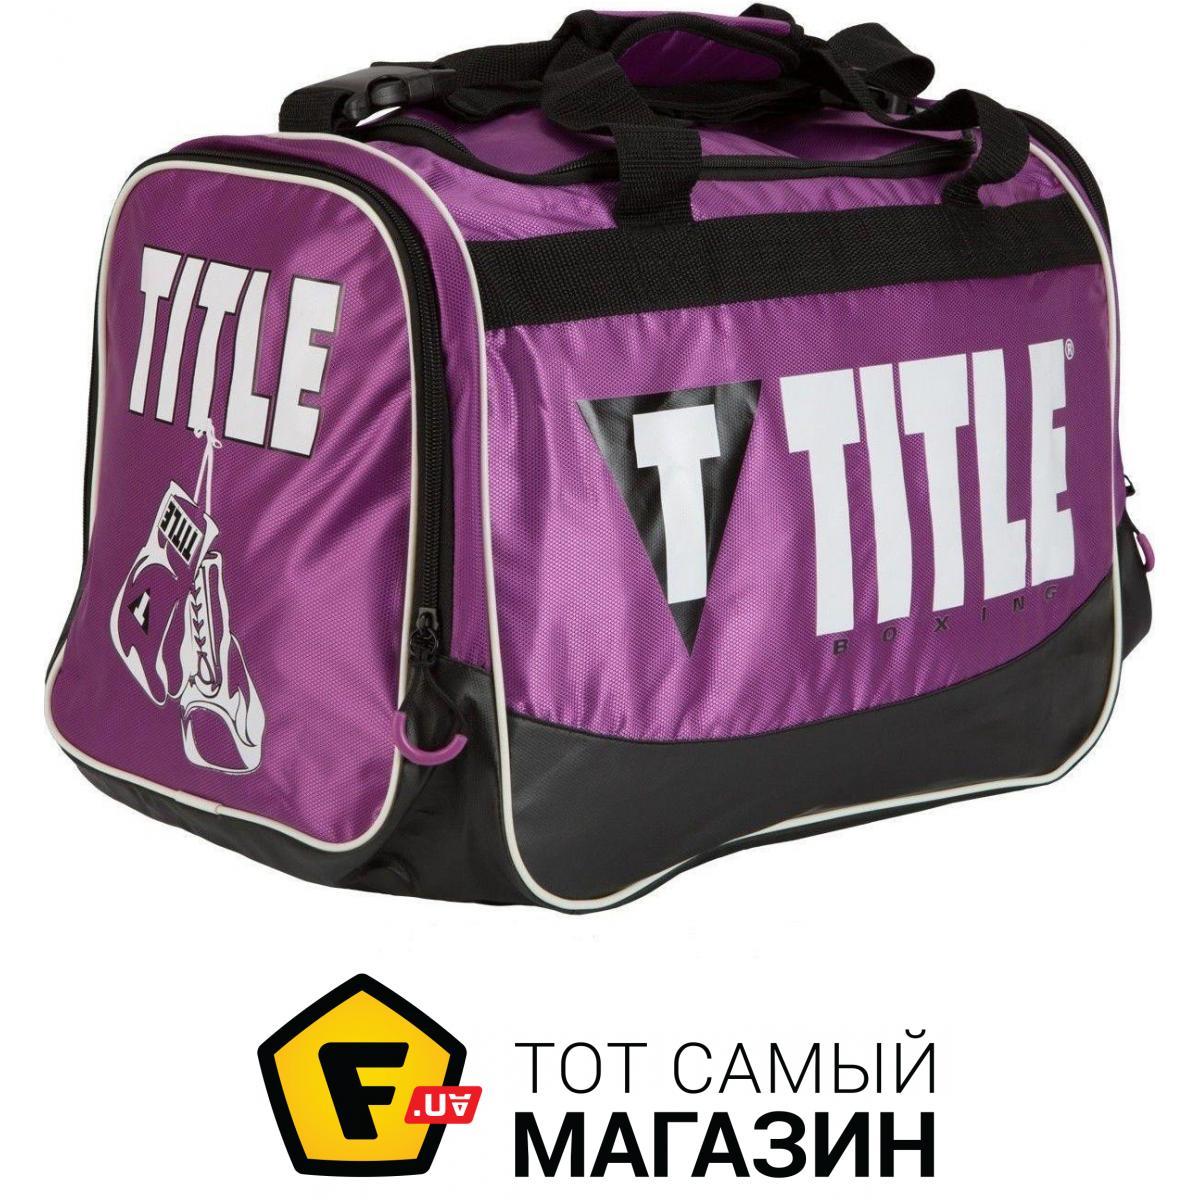 d3166c36bf08 ᐈ TITLE BOXING Ignite Personal Gear Bag фиолетовый (TBAG-17 ...